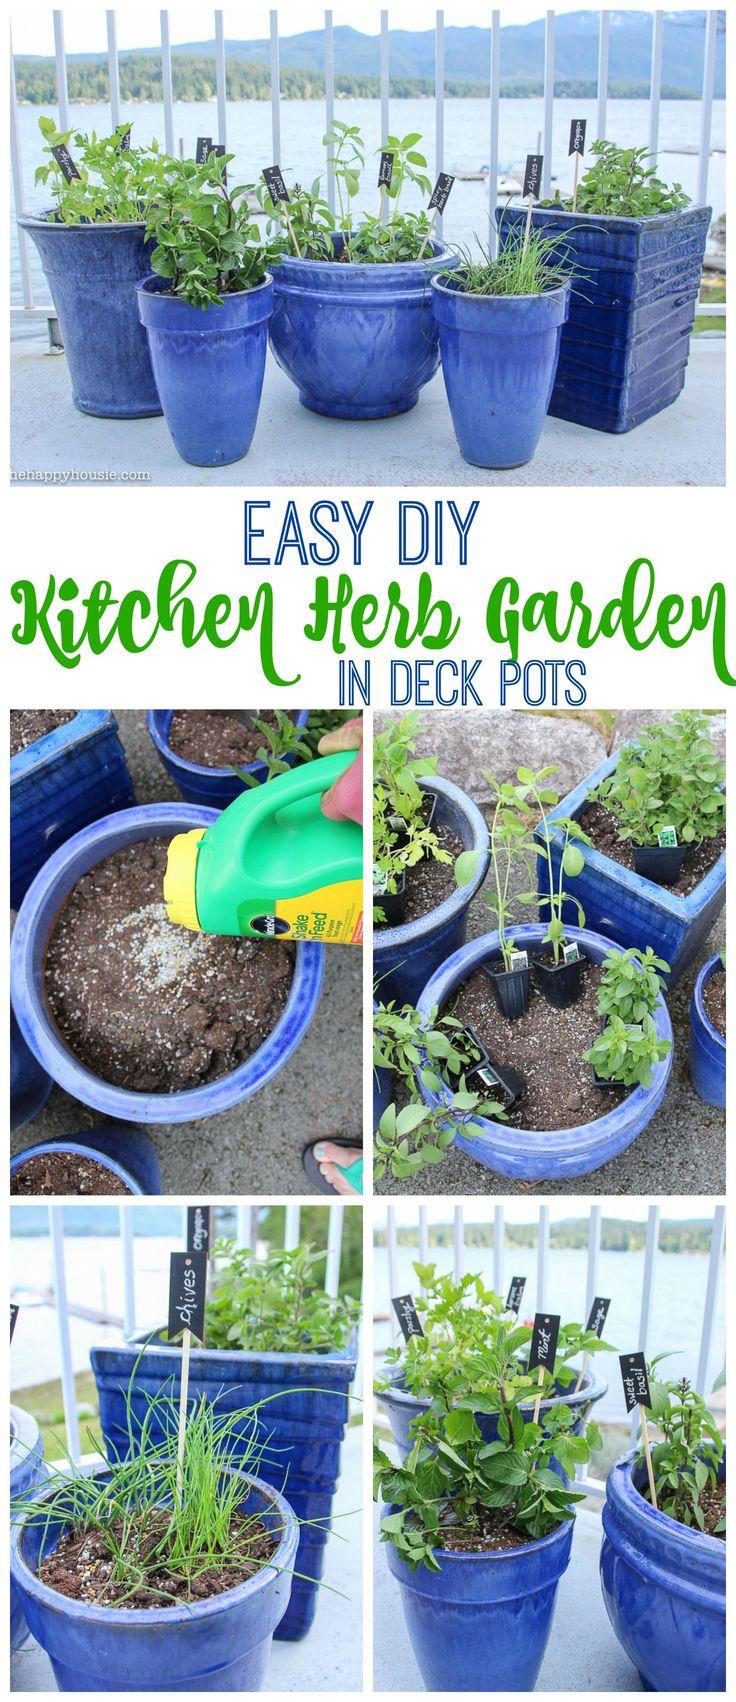 The 25 best kitchen herbs ideas on pinterest indoor herbs growing herbs indoors and herb - Indoor herb garden containers ...